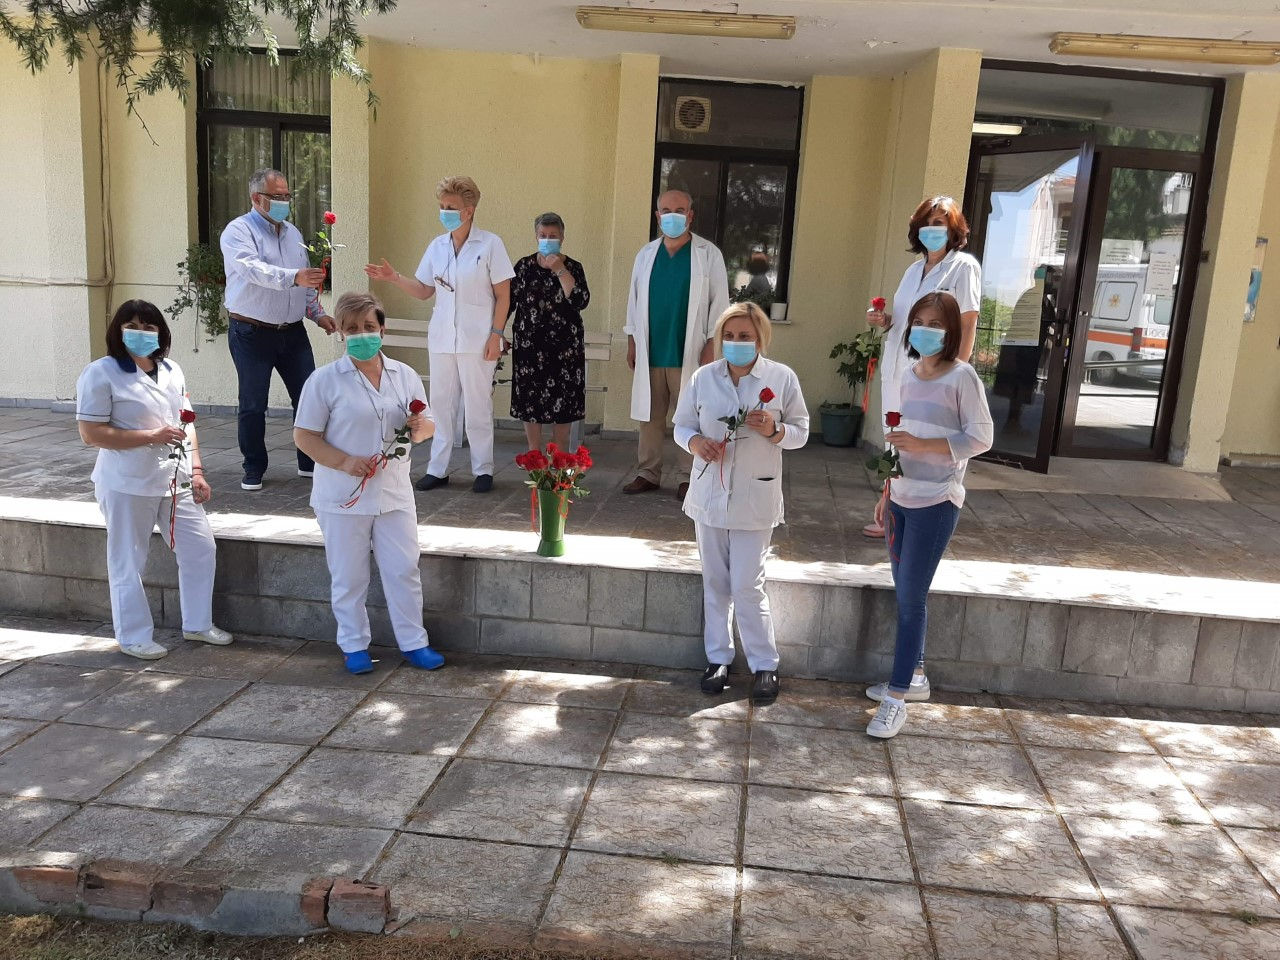 Photo of Εορτάστηκε η παγκόσμια ημέρα νοσηλευτών/τριων στο Κ.Υ. Φαρσάλων